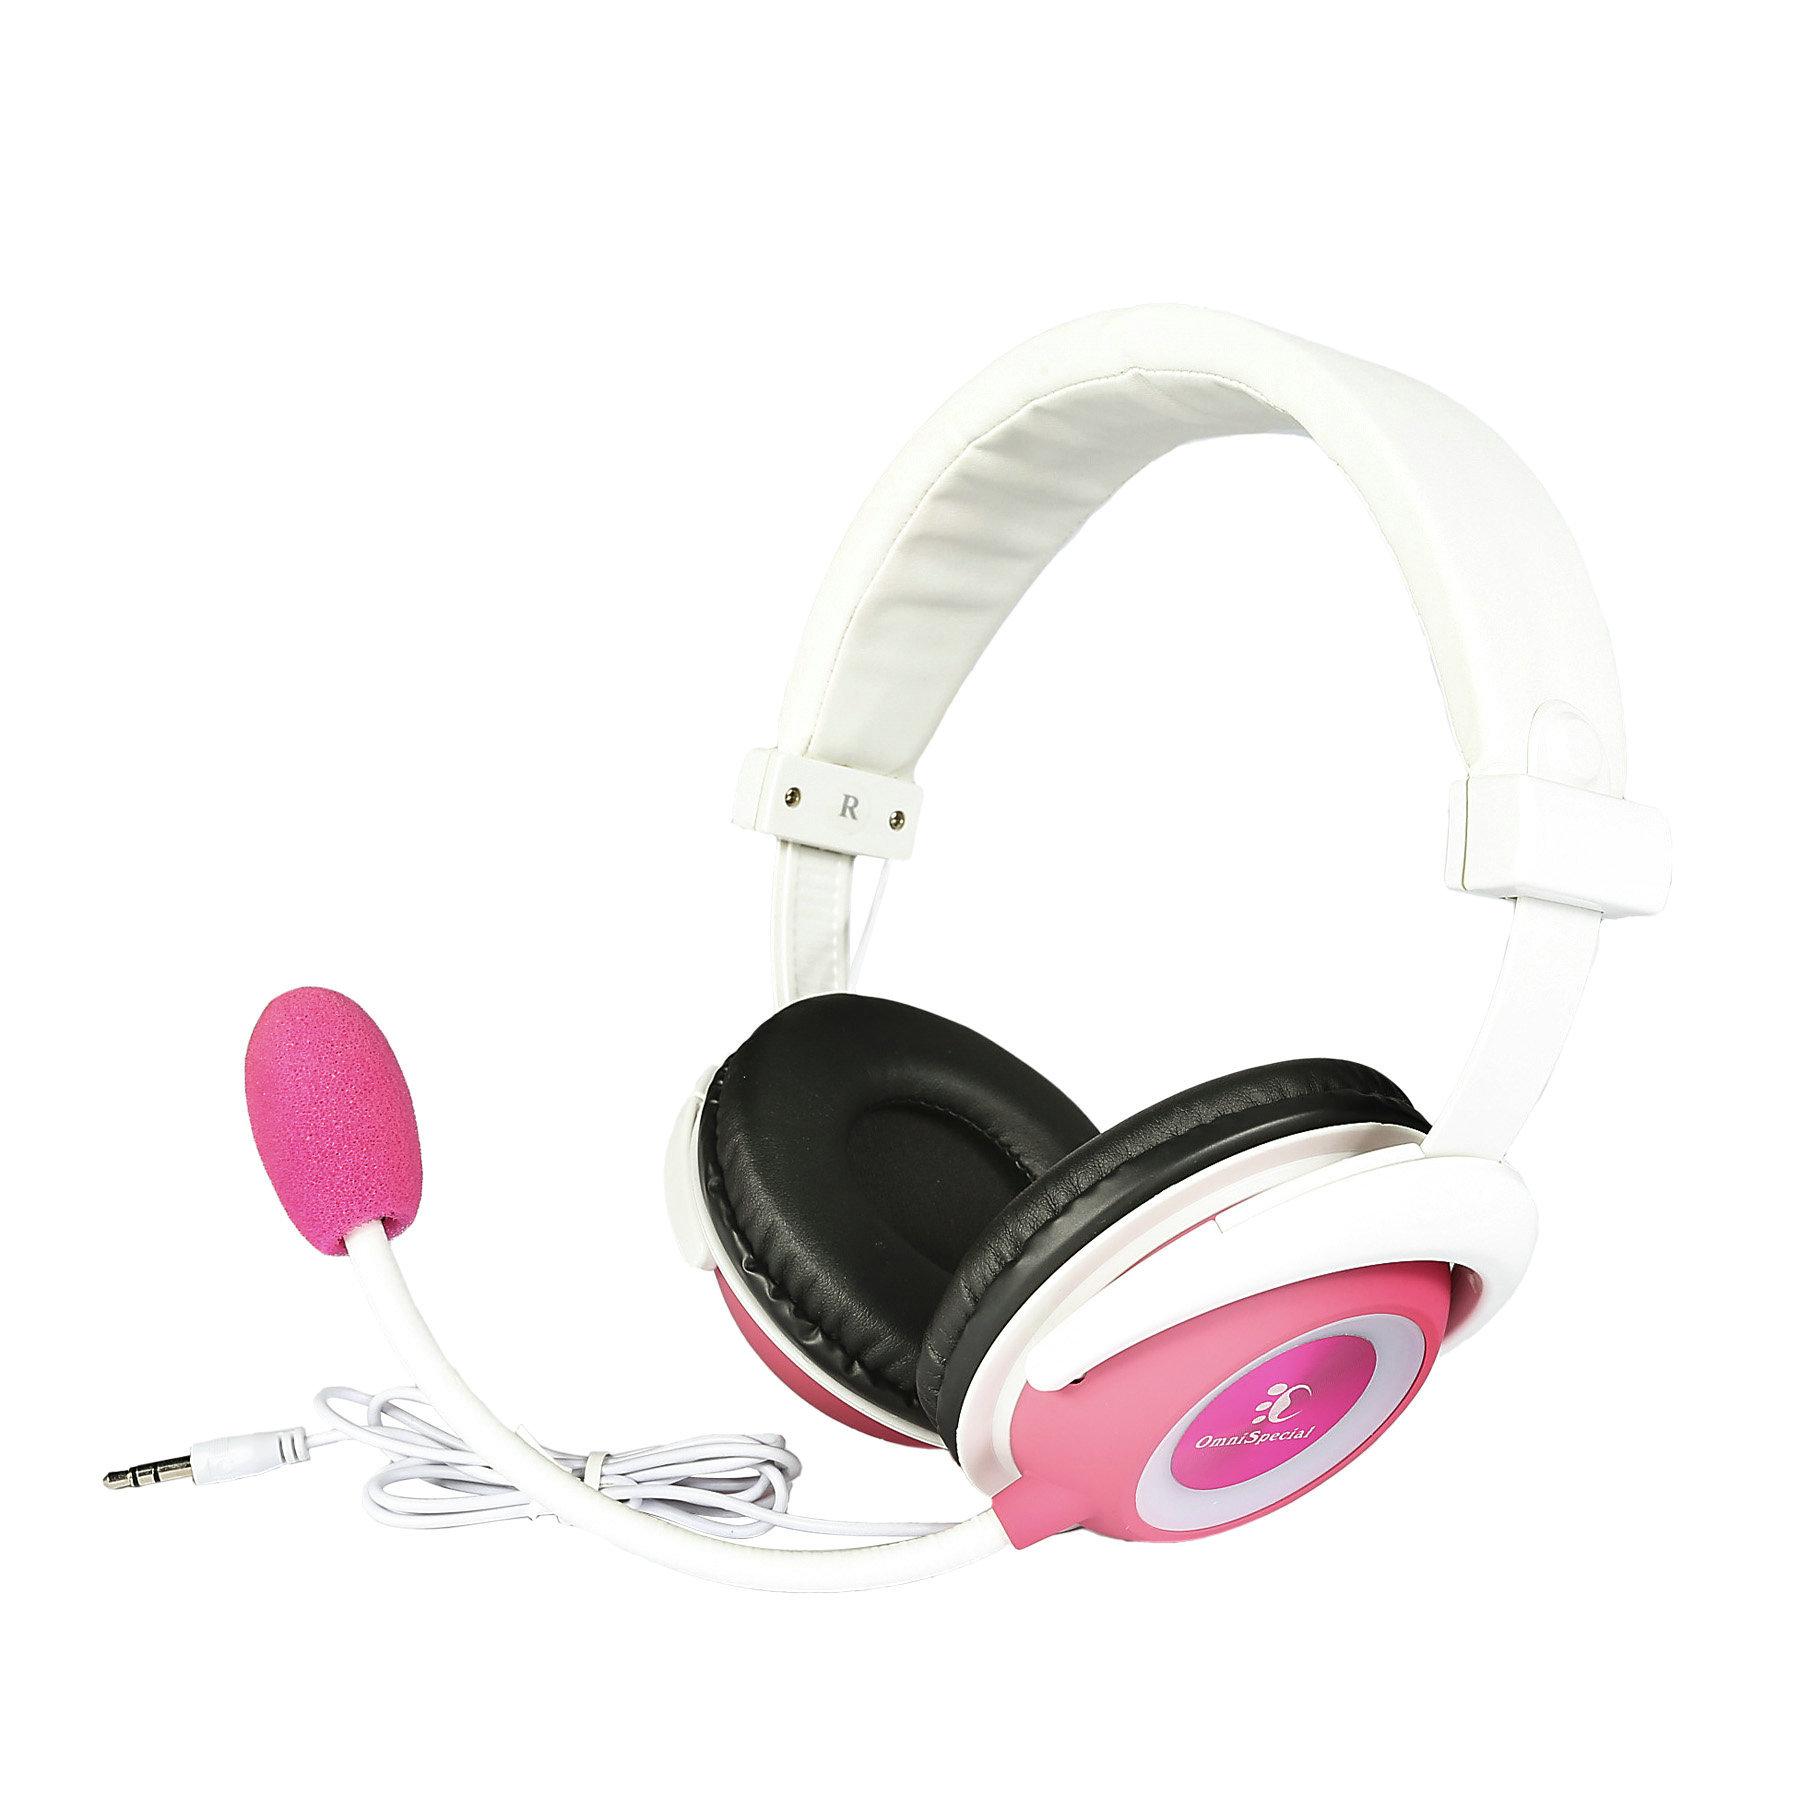 omnispecial e021 耳机好不好,怎么样,值得买吗